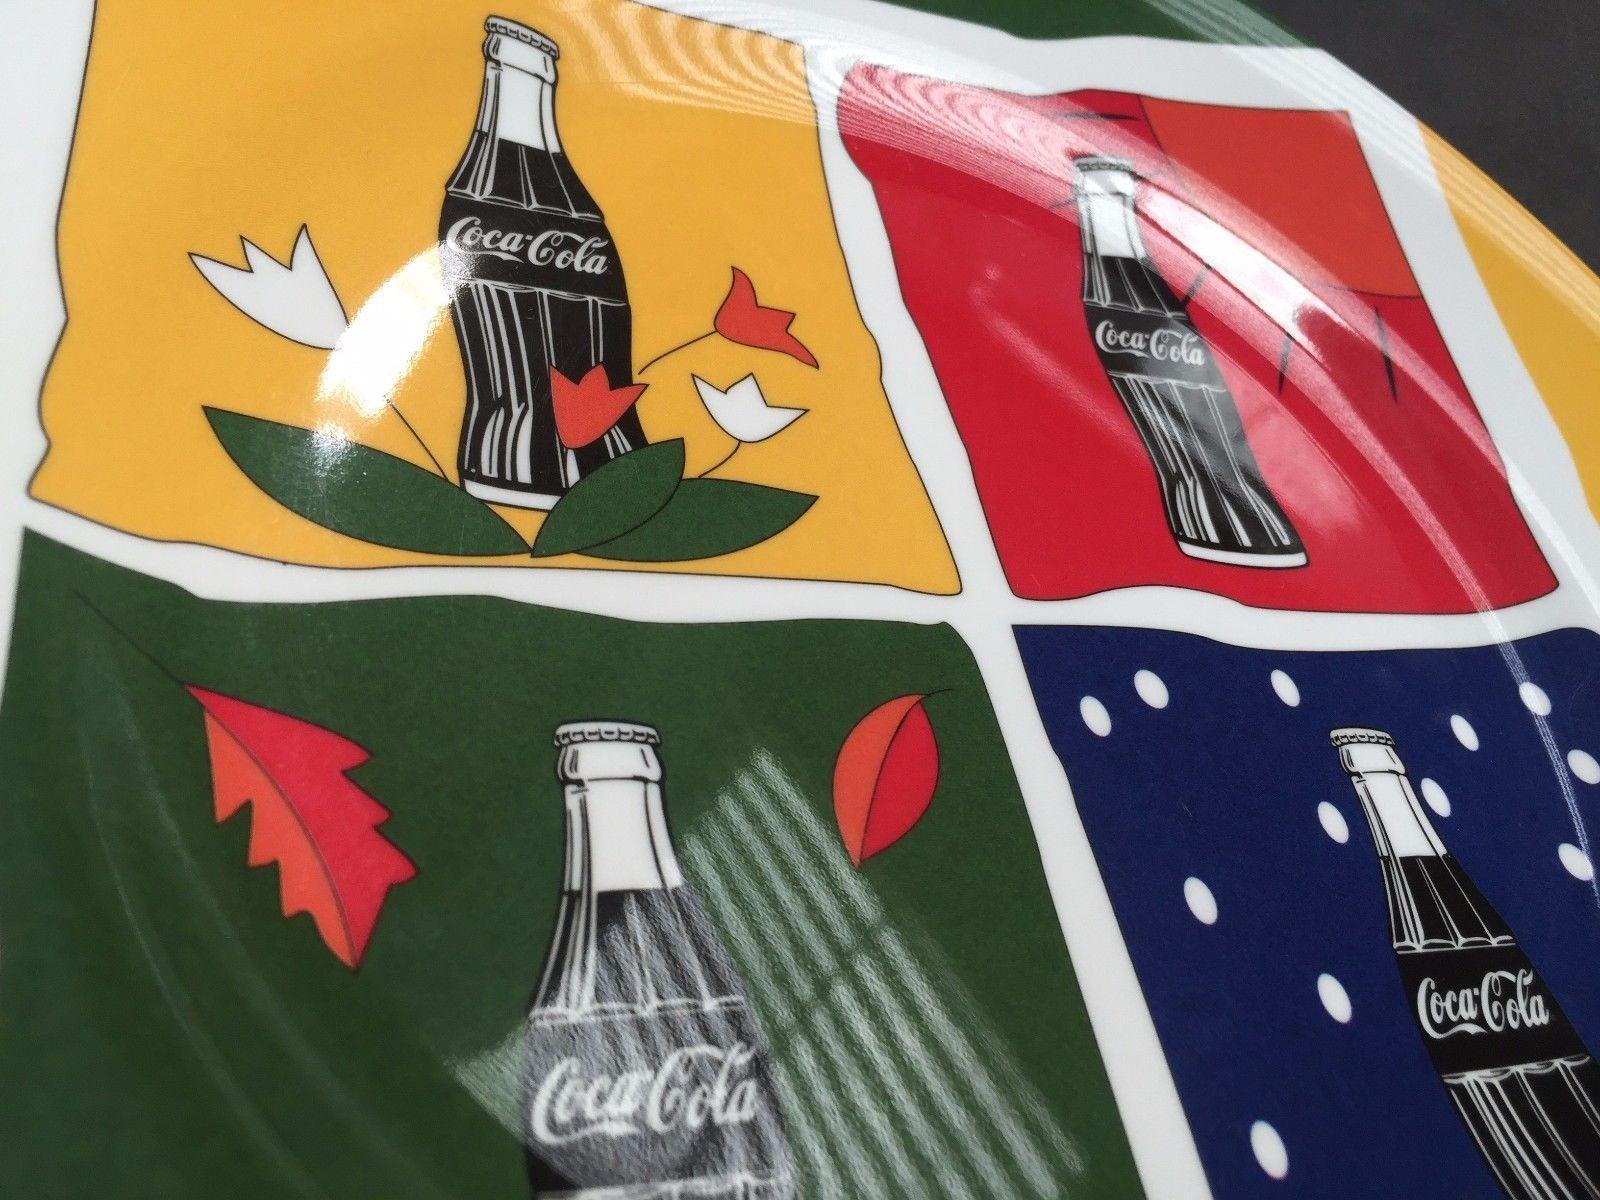 4 pieces COKE Coca Cola Dinnerware Gibson Dinner Plates 1998